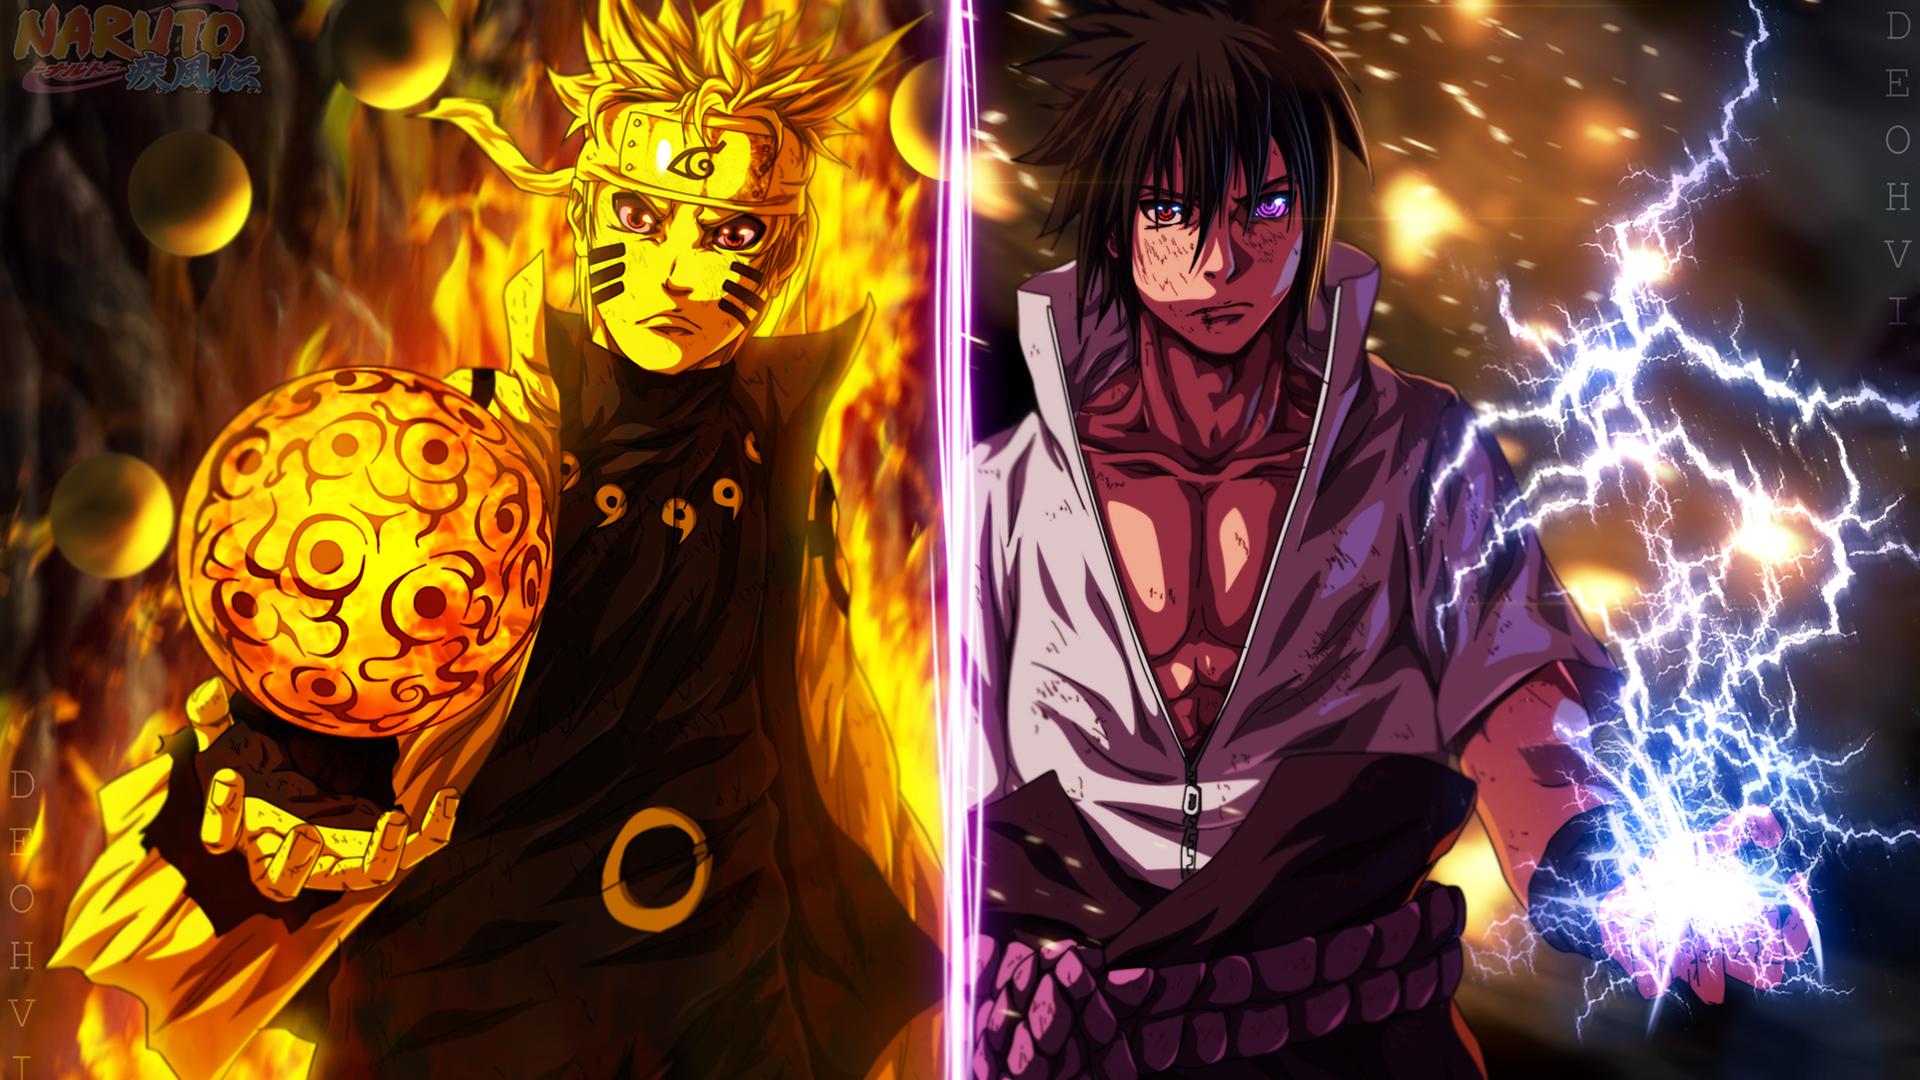 Naruto and Sasuke Wallpaper HD 1920x1080